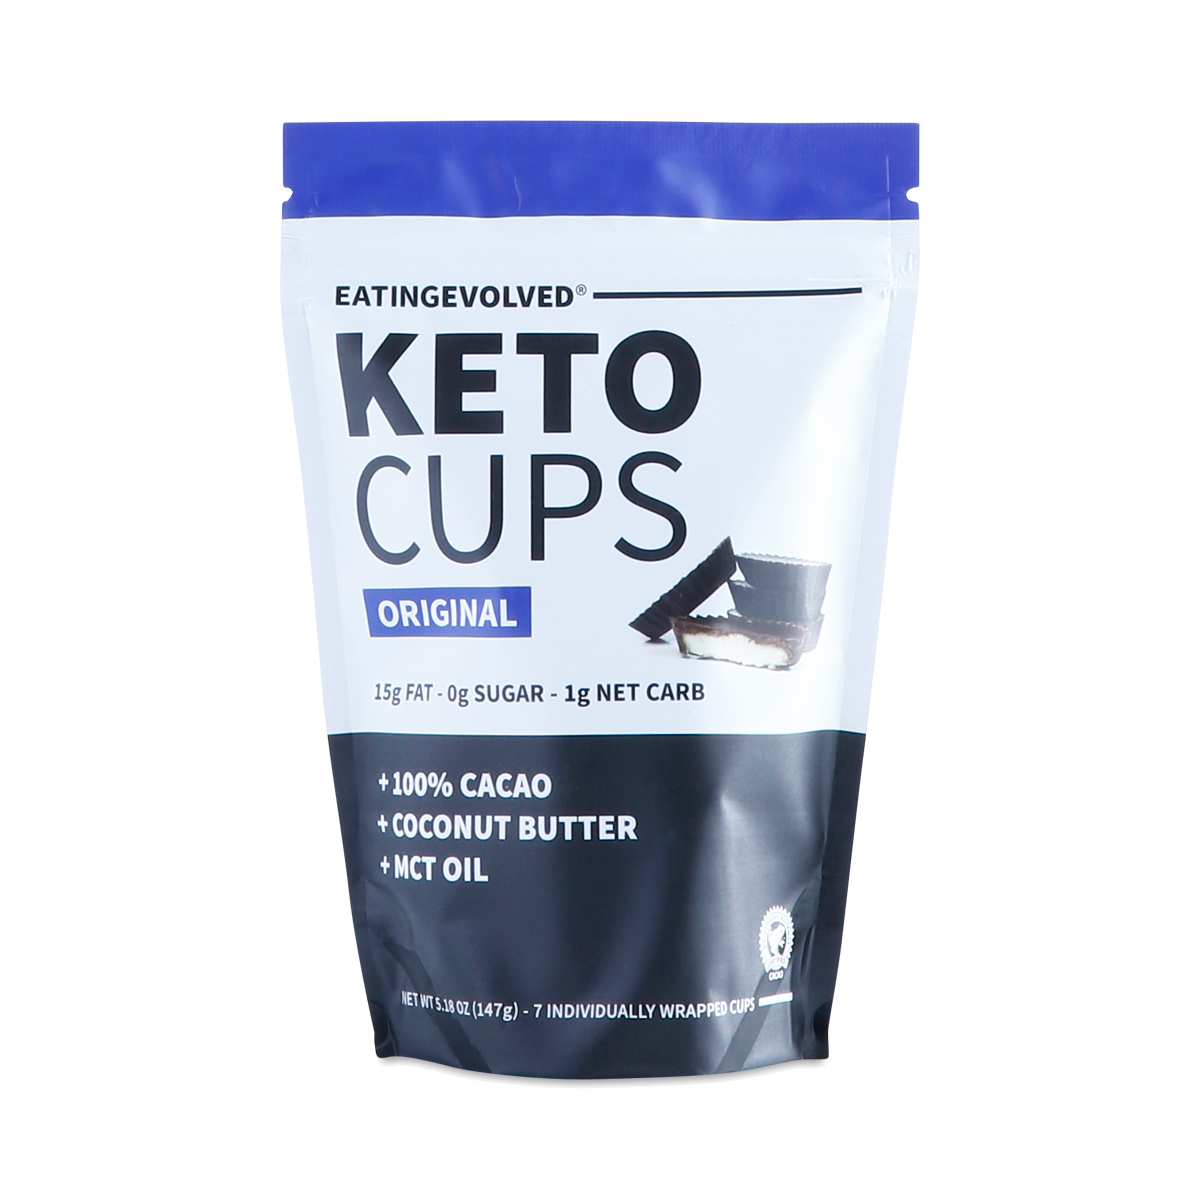 748252204738 1 The Coffee Bean And Tea Leaf K Cups